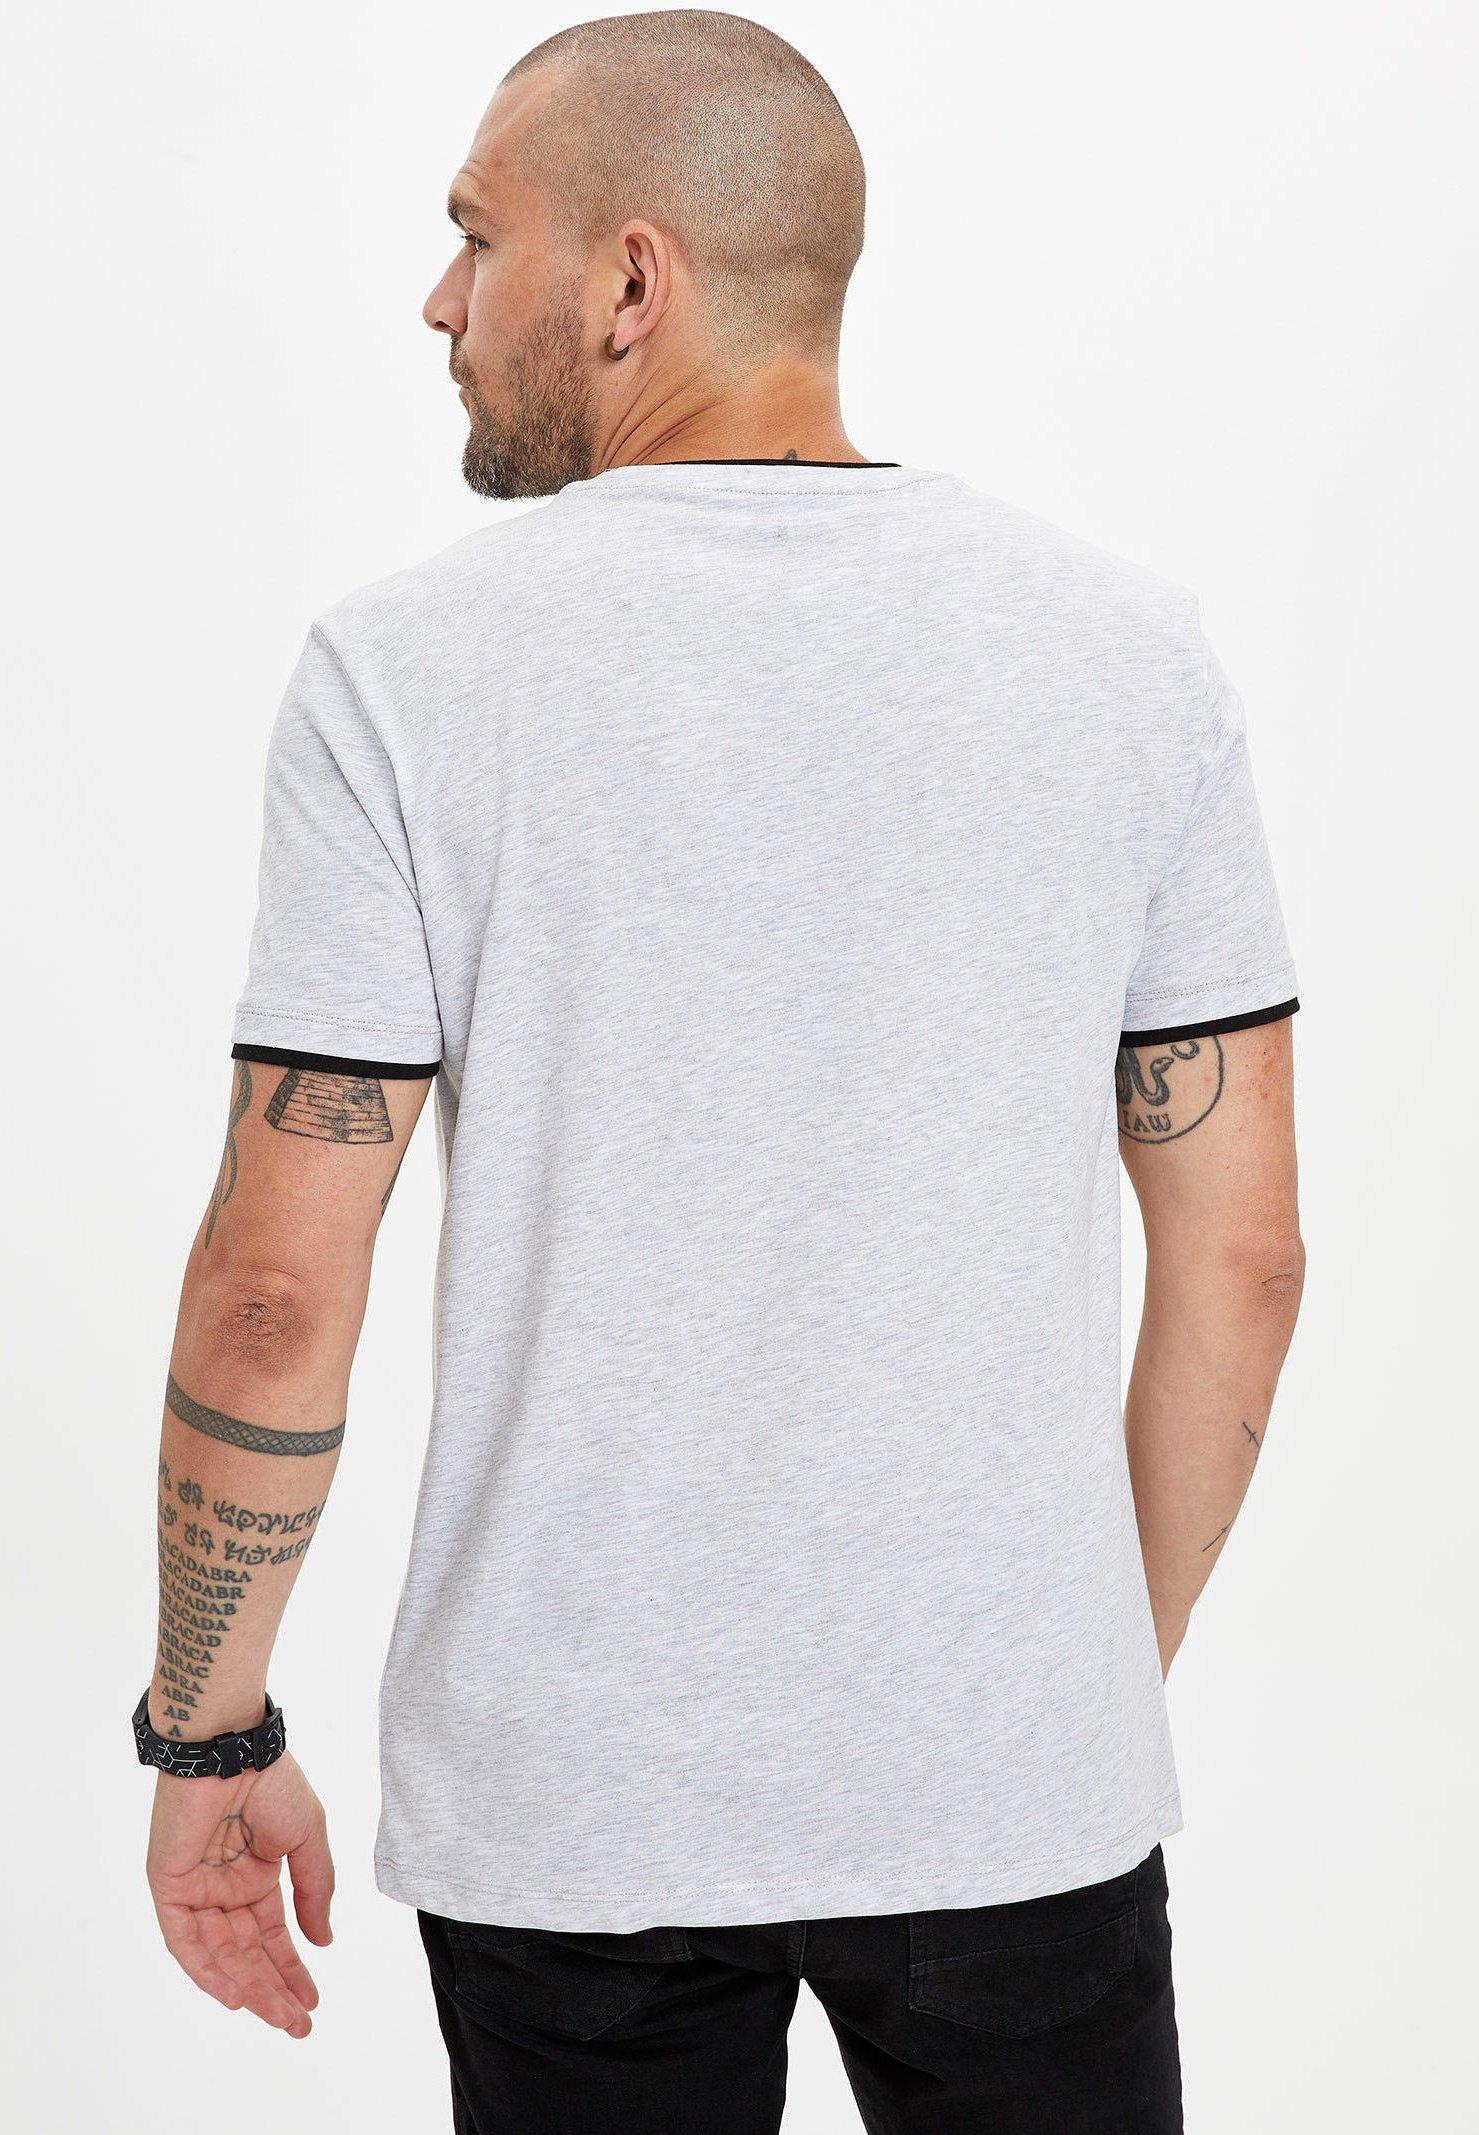 DeFacto Print T-shirt - grey clUor